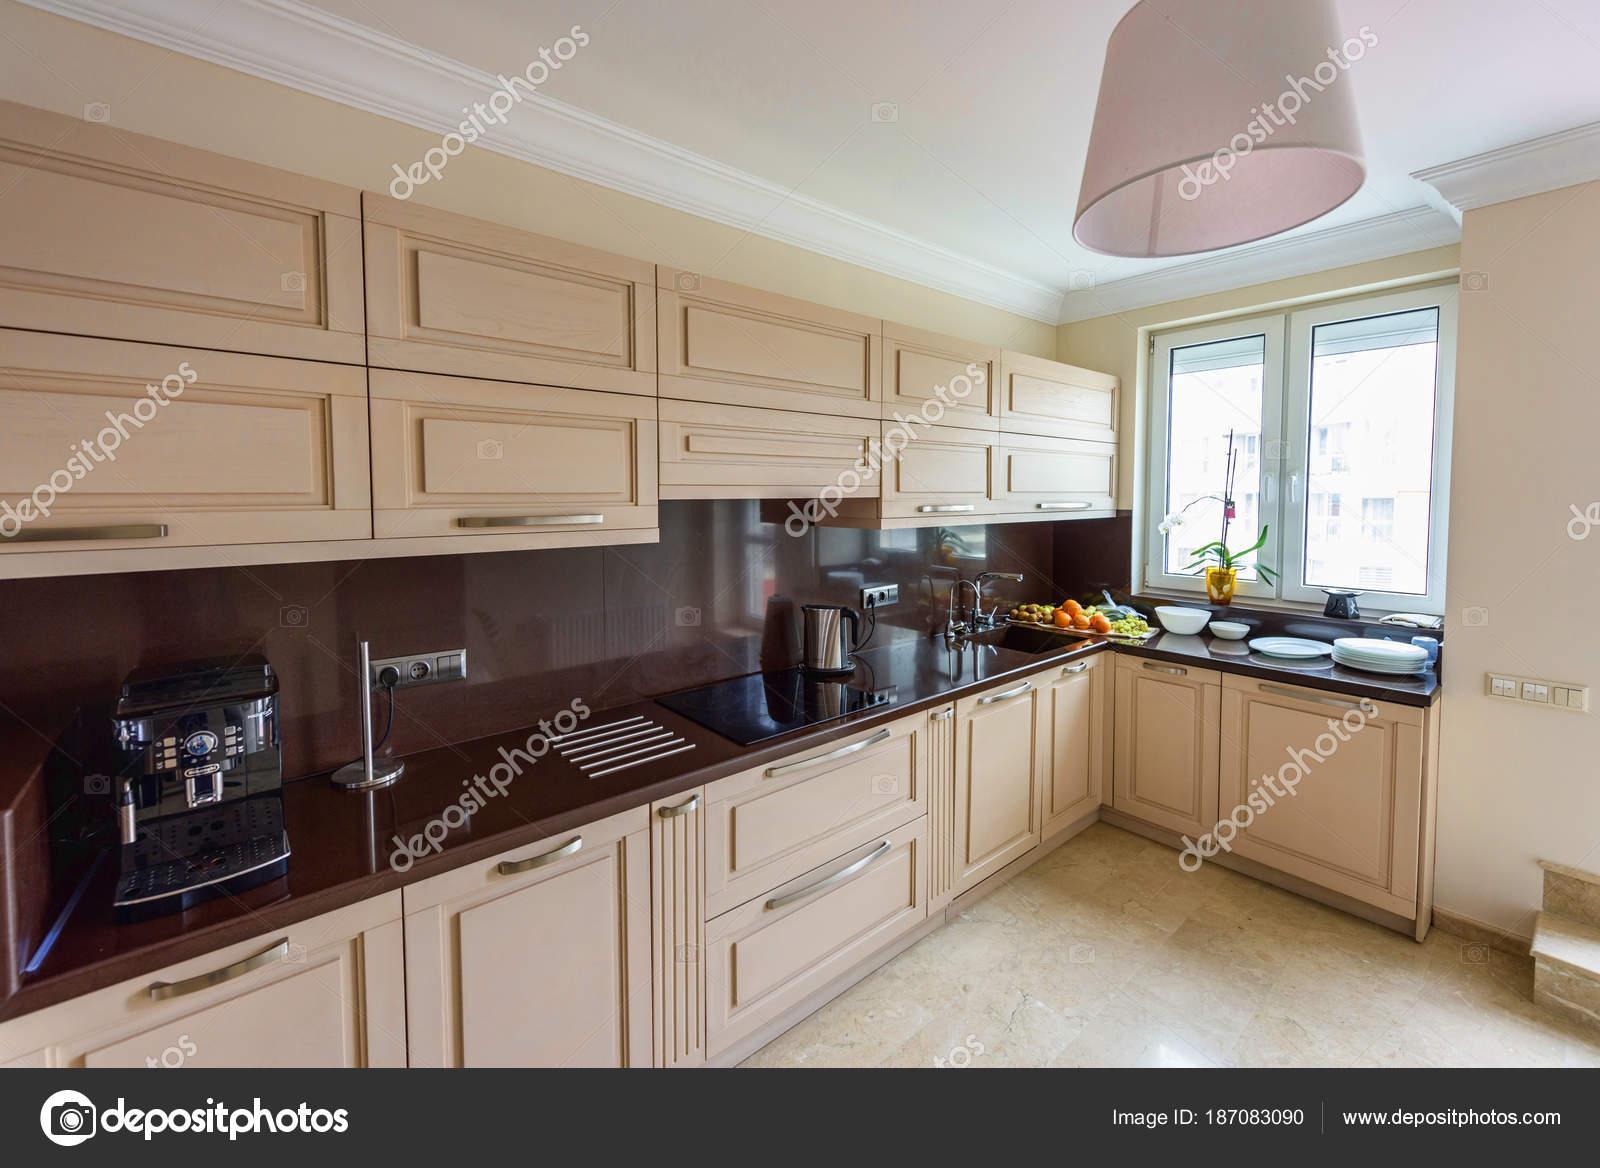 moderne keuken interieur appartement ontwerp groothoek foto stockfoto